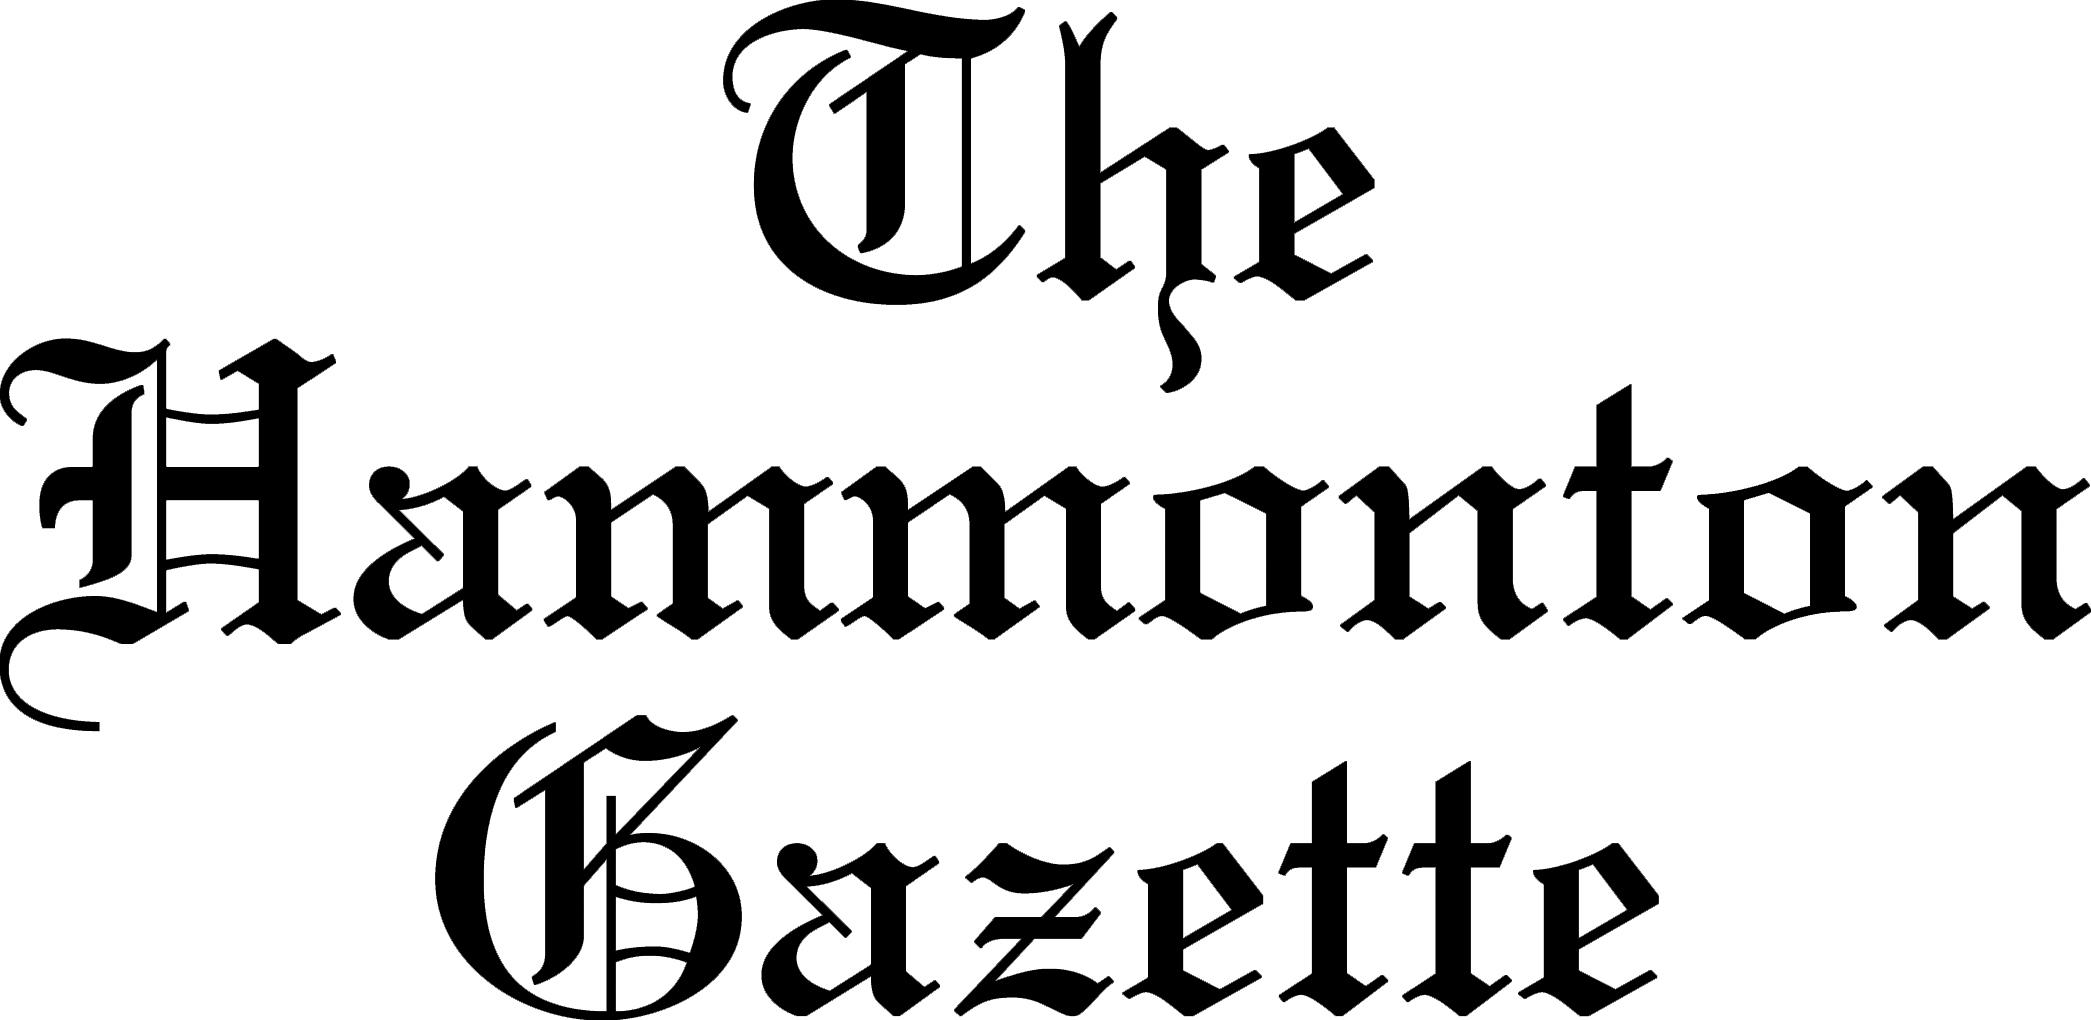 hammonton gazette logo